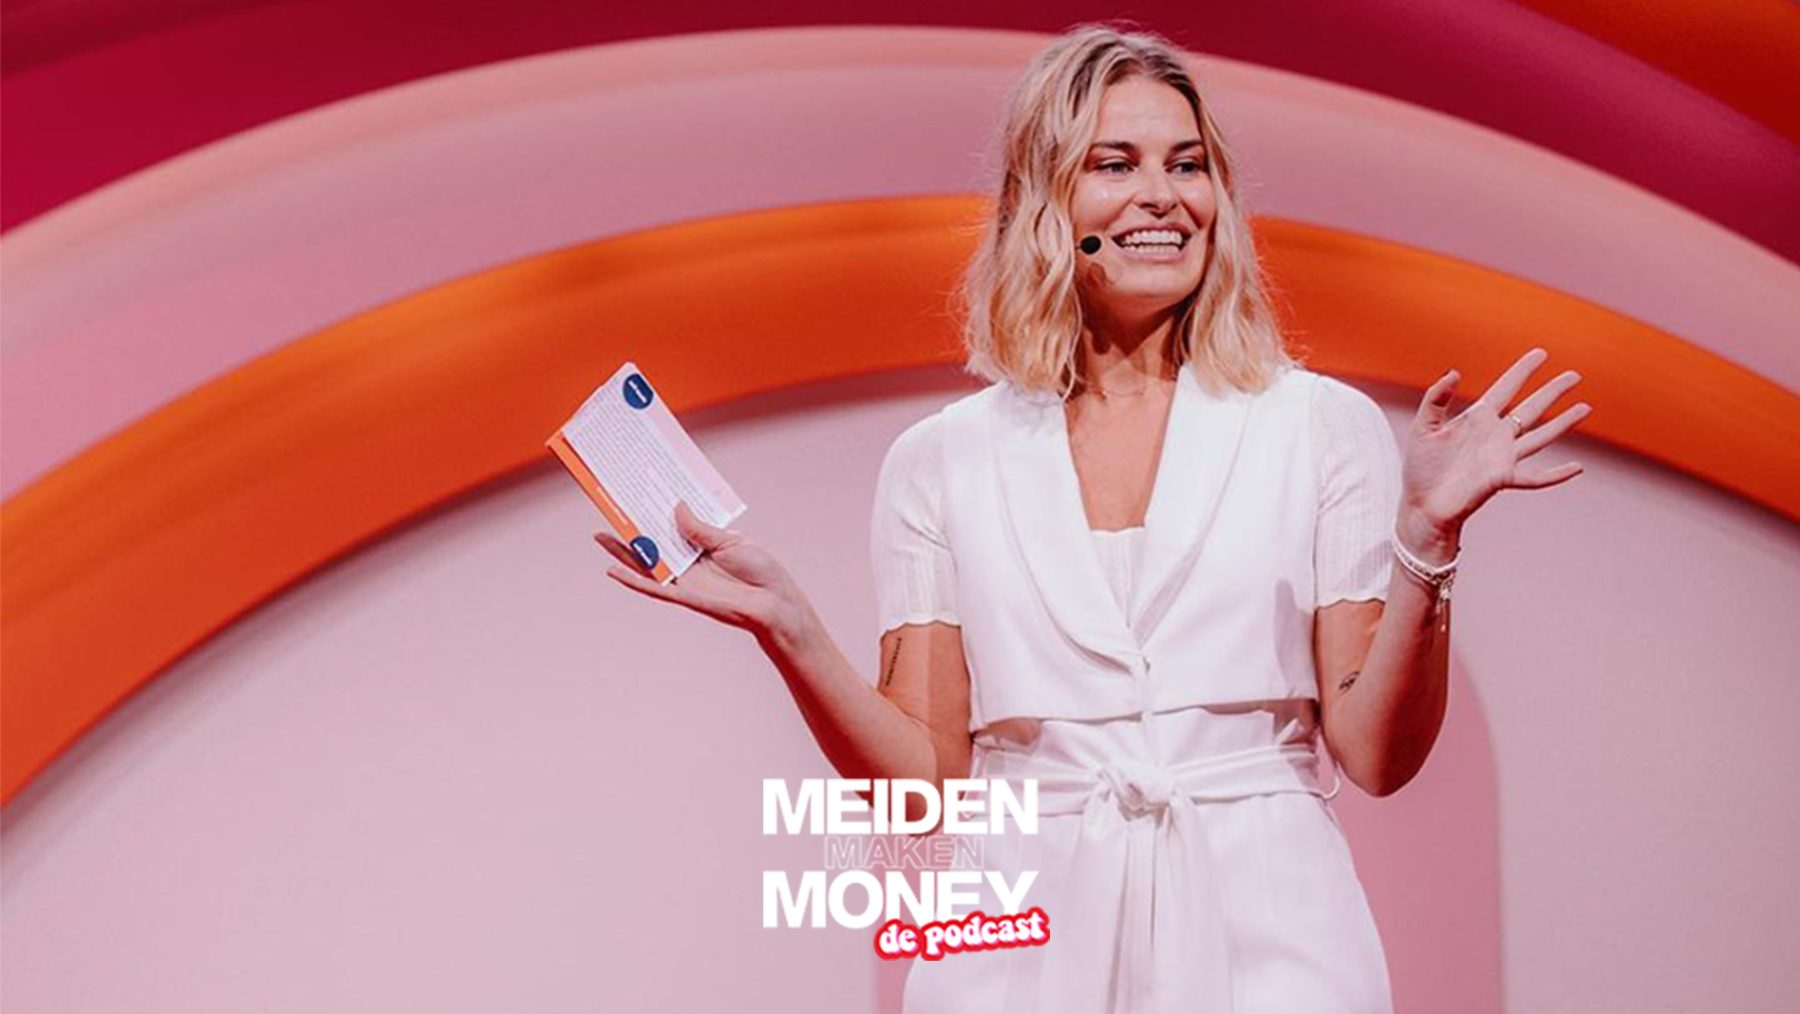 Meiden Maken Money de Podcast